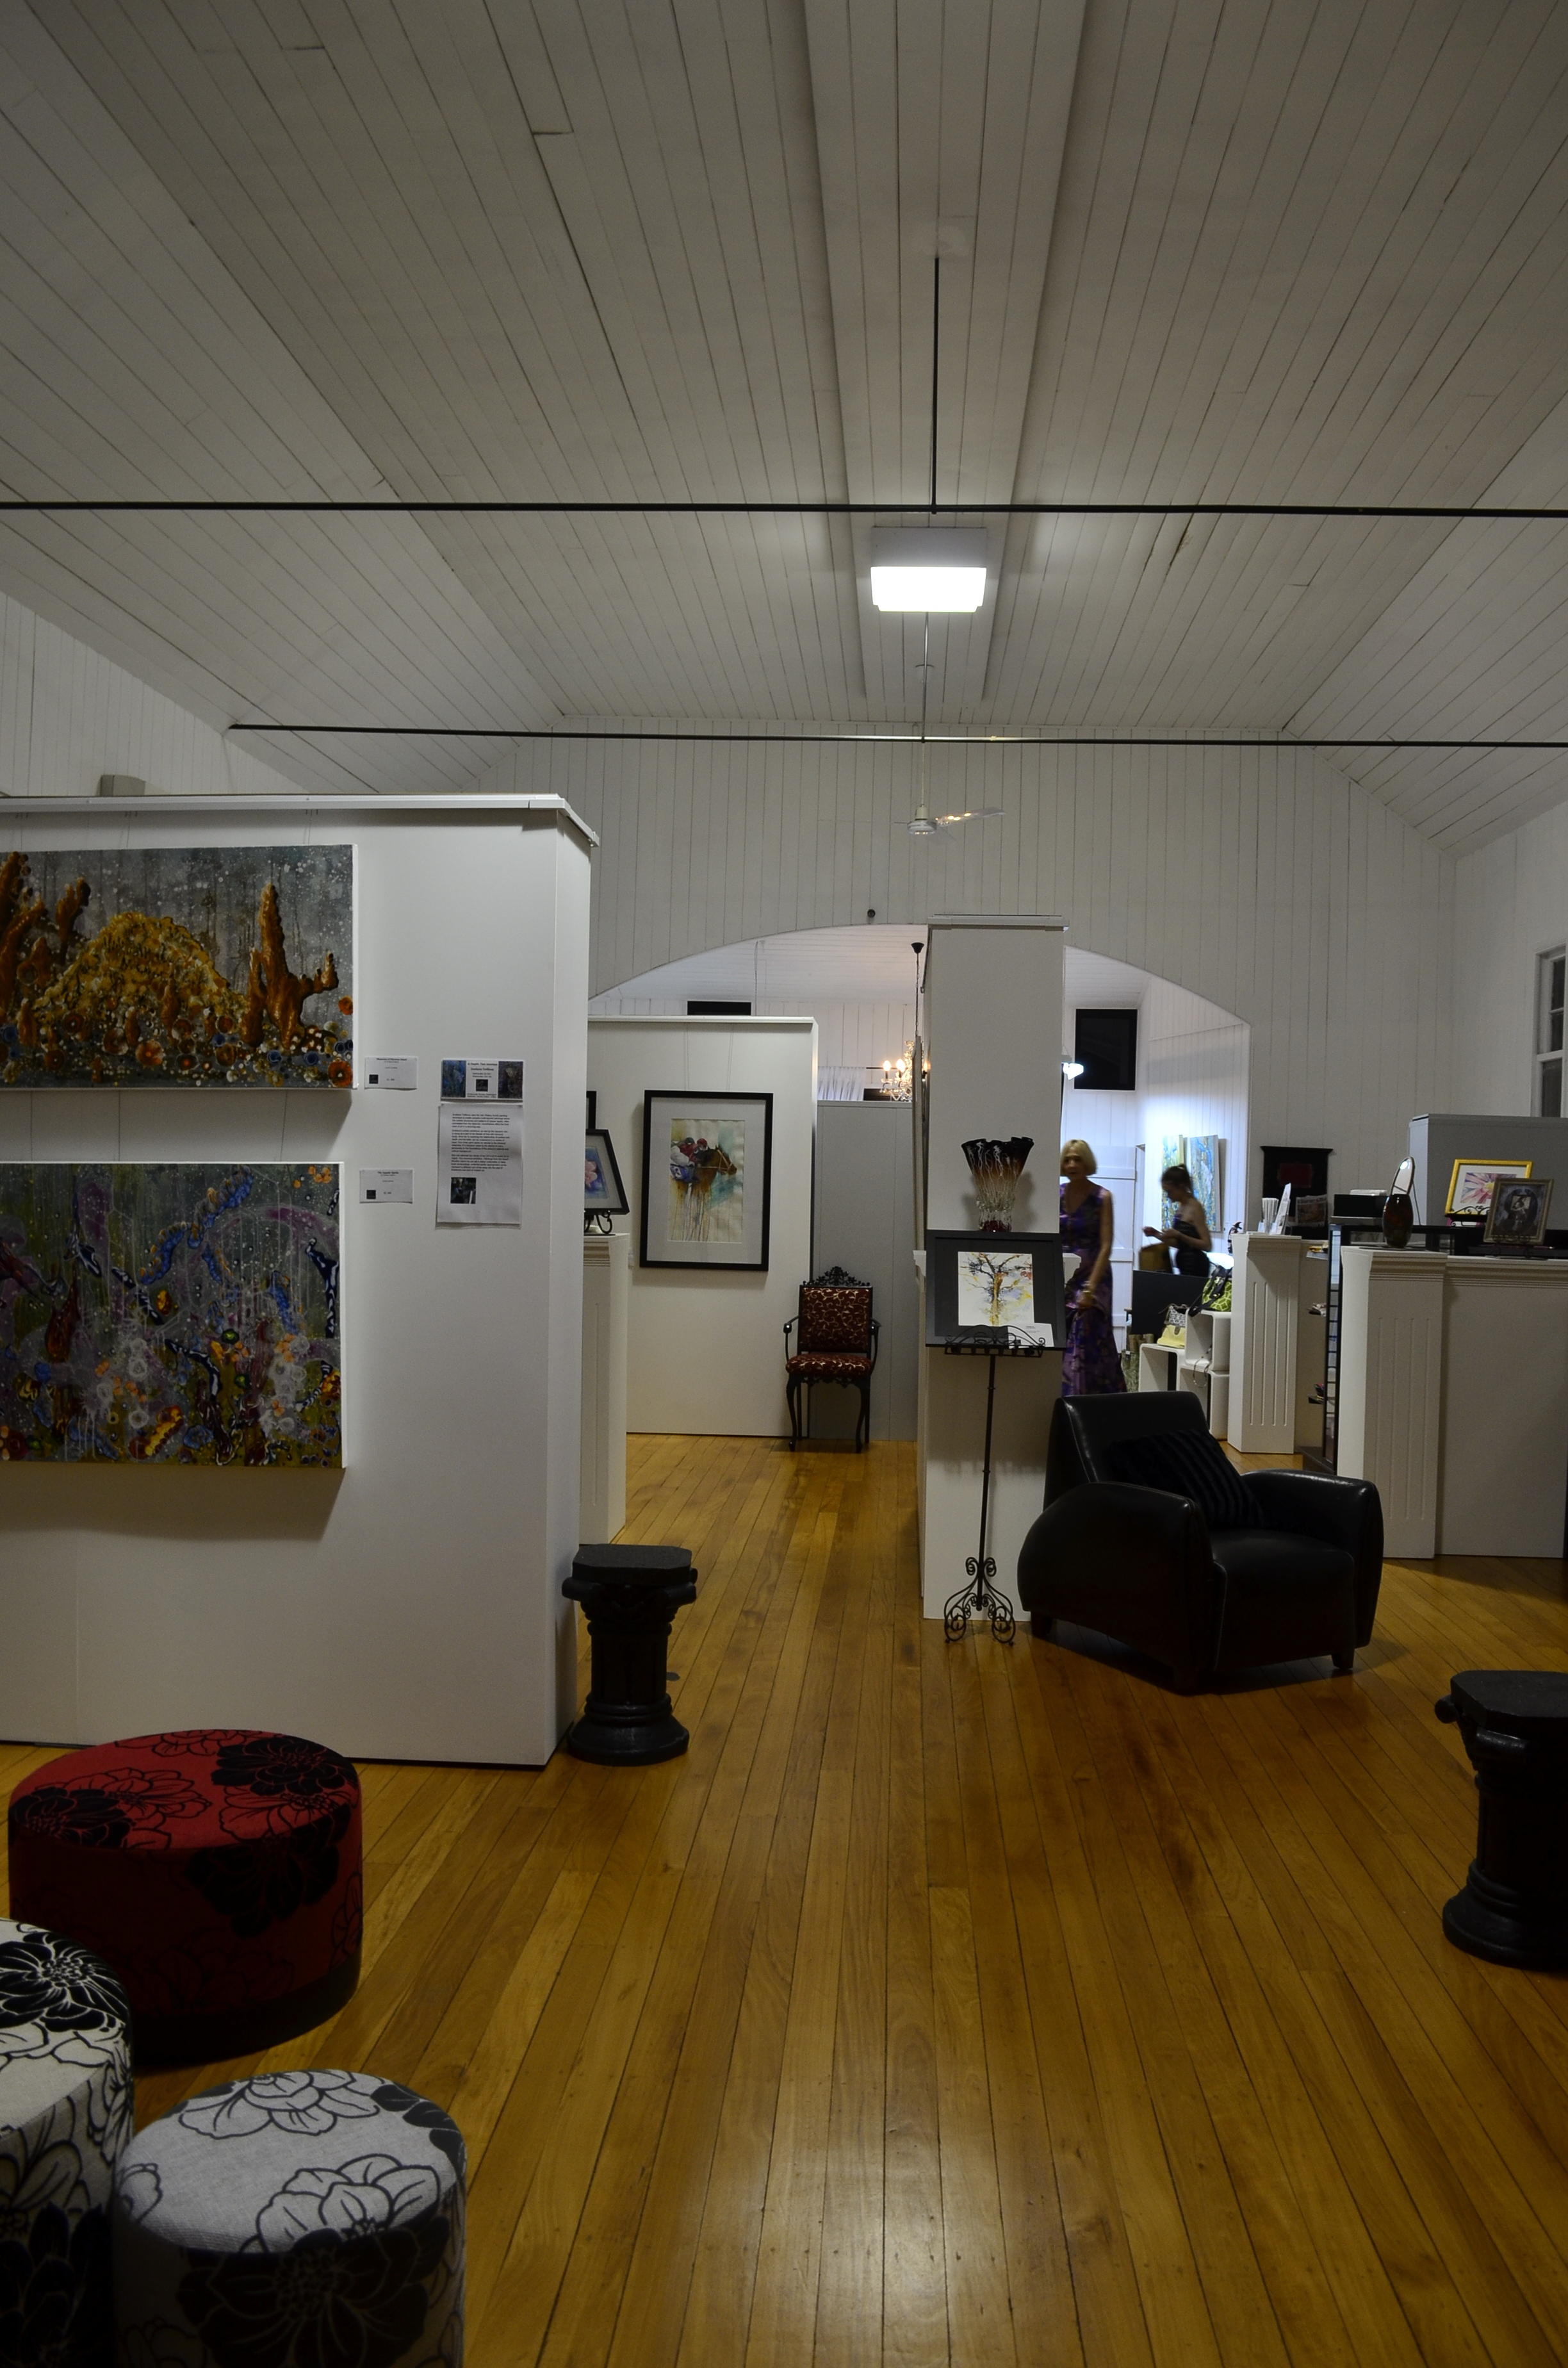 vanessa murillo- photo of aspire gallery